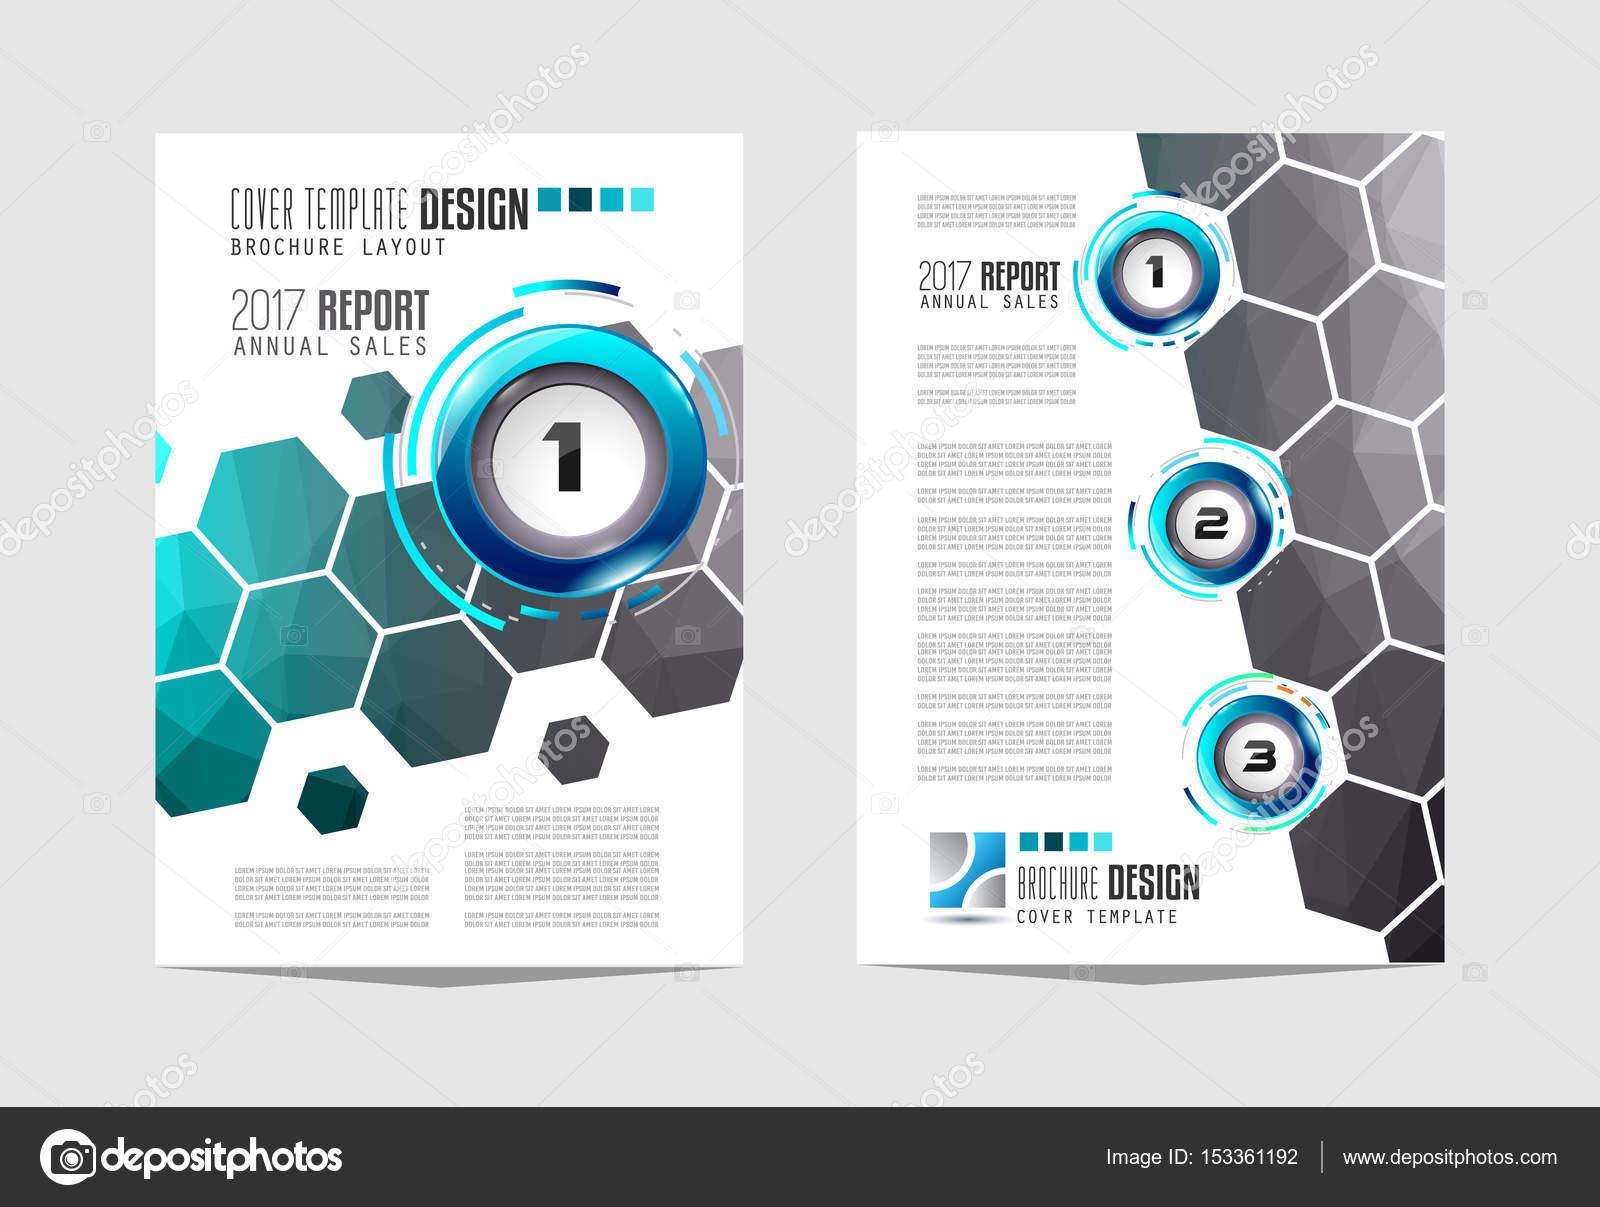 Broschüre-Vorlage, Flyer Design — Stockvektor © DavidArts #153361192